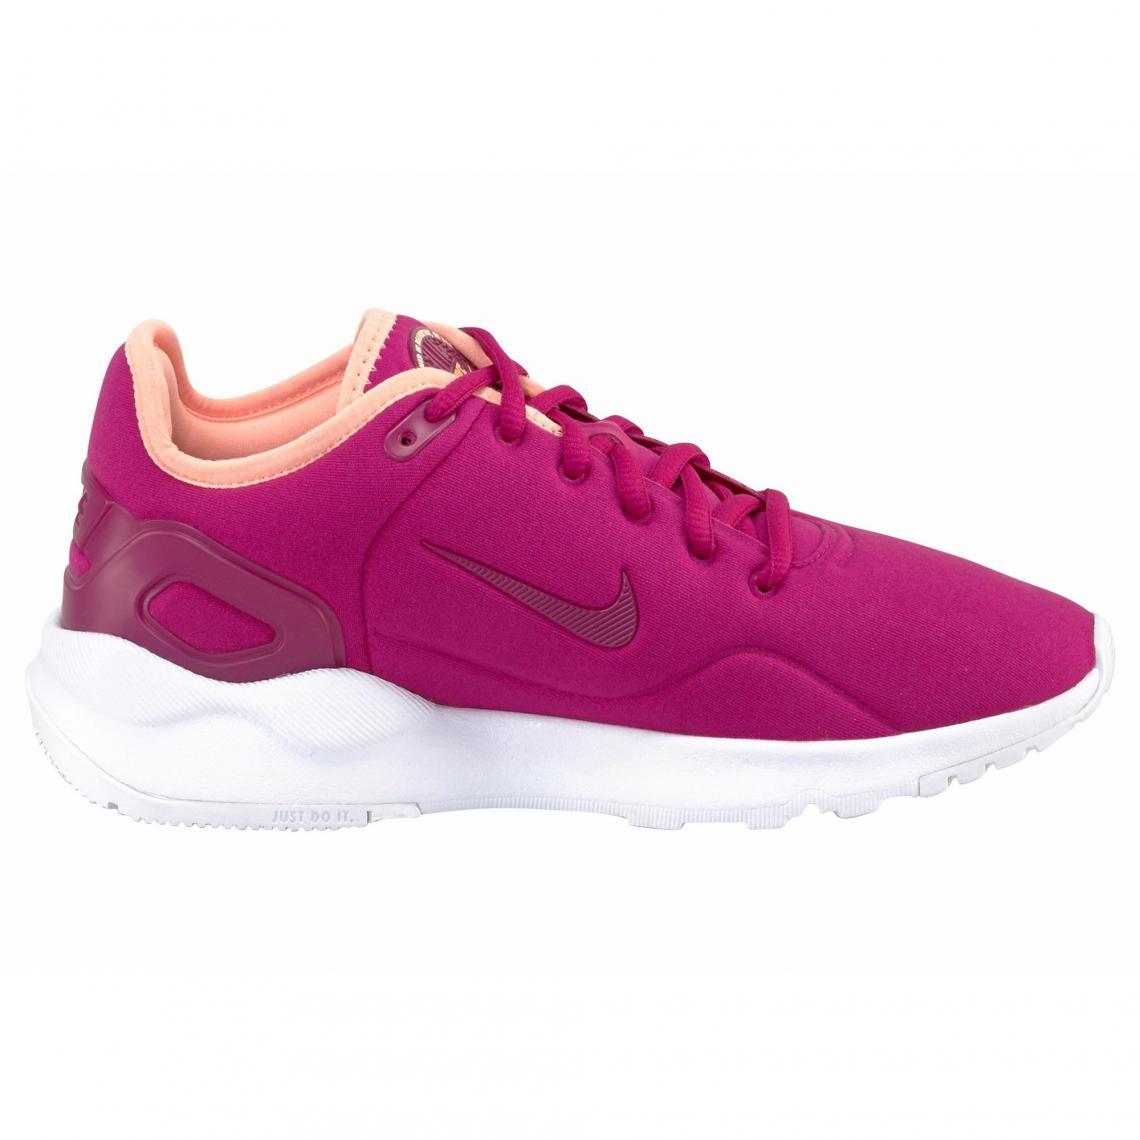 best sneakers f2bc8 126b4 Nike Sneaker »Wmns LD Runner LW SE« - Rose Vif Nike Femme